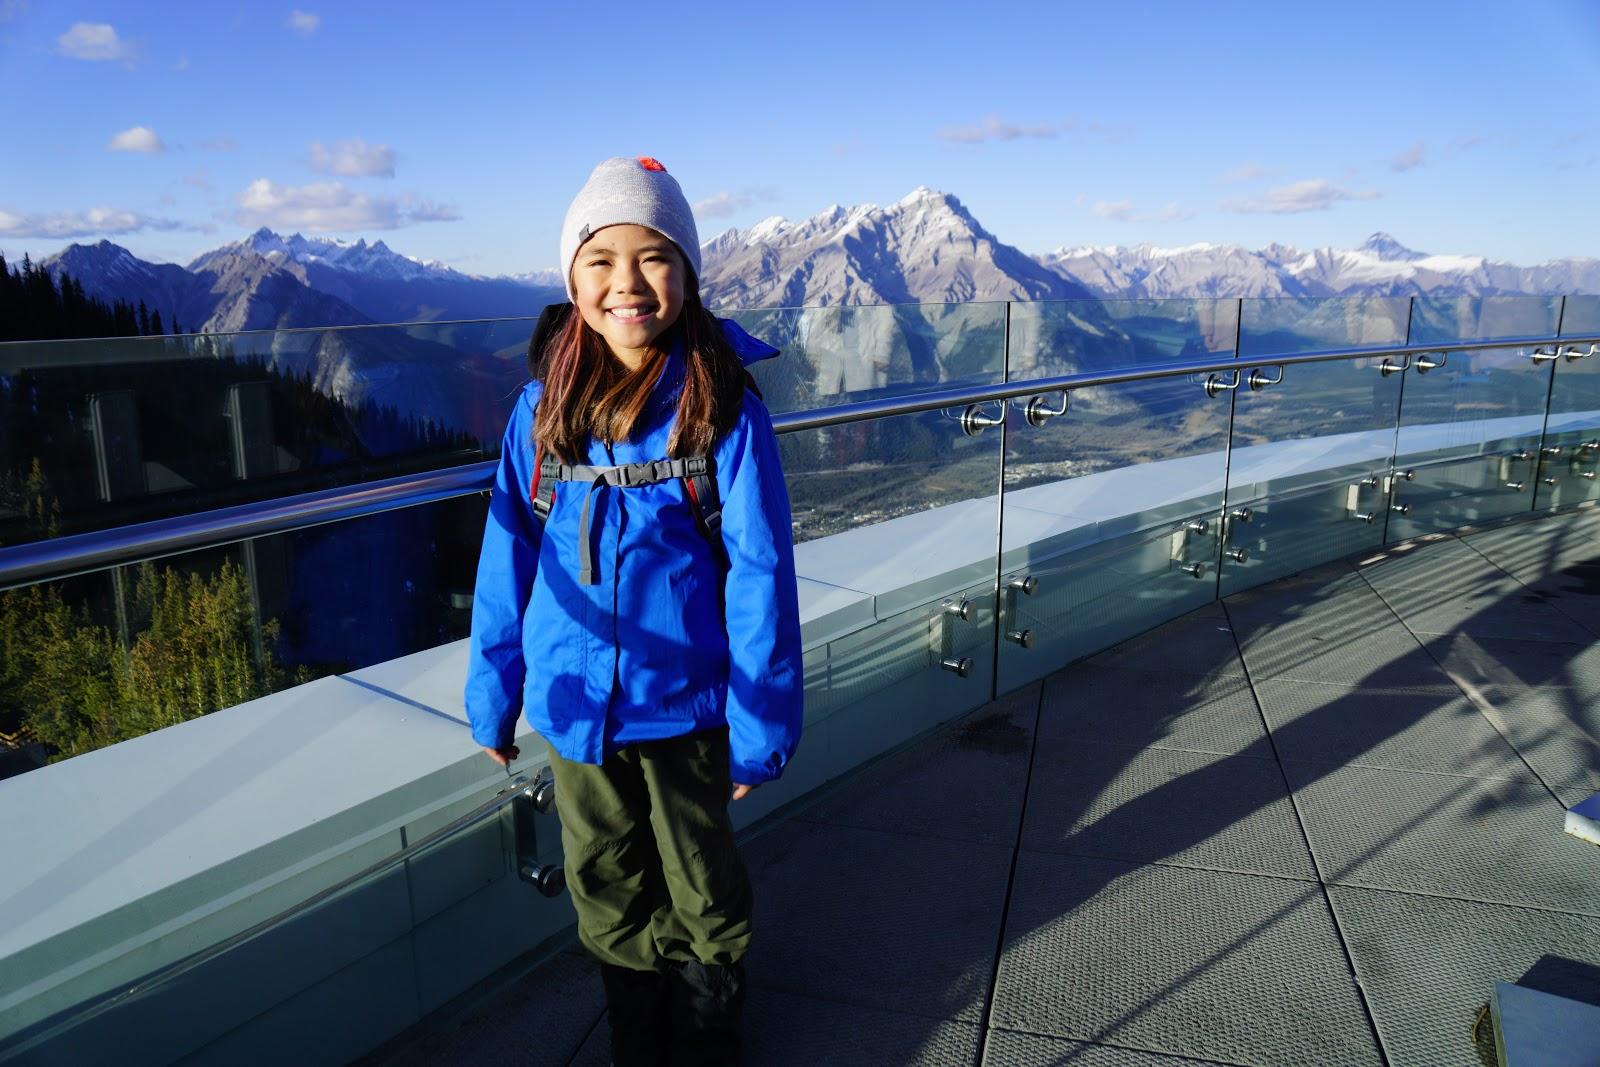 Banff Gondola Upper Terminal Observation Deck